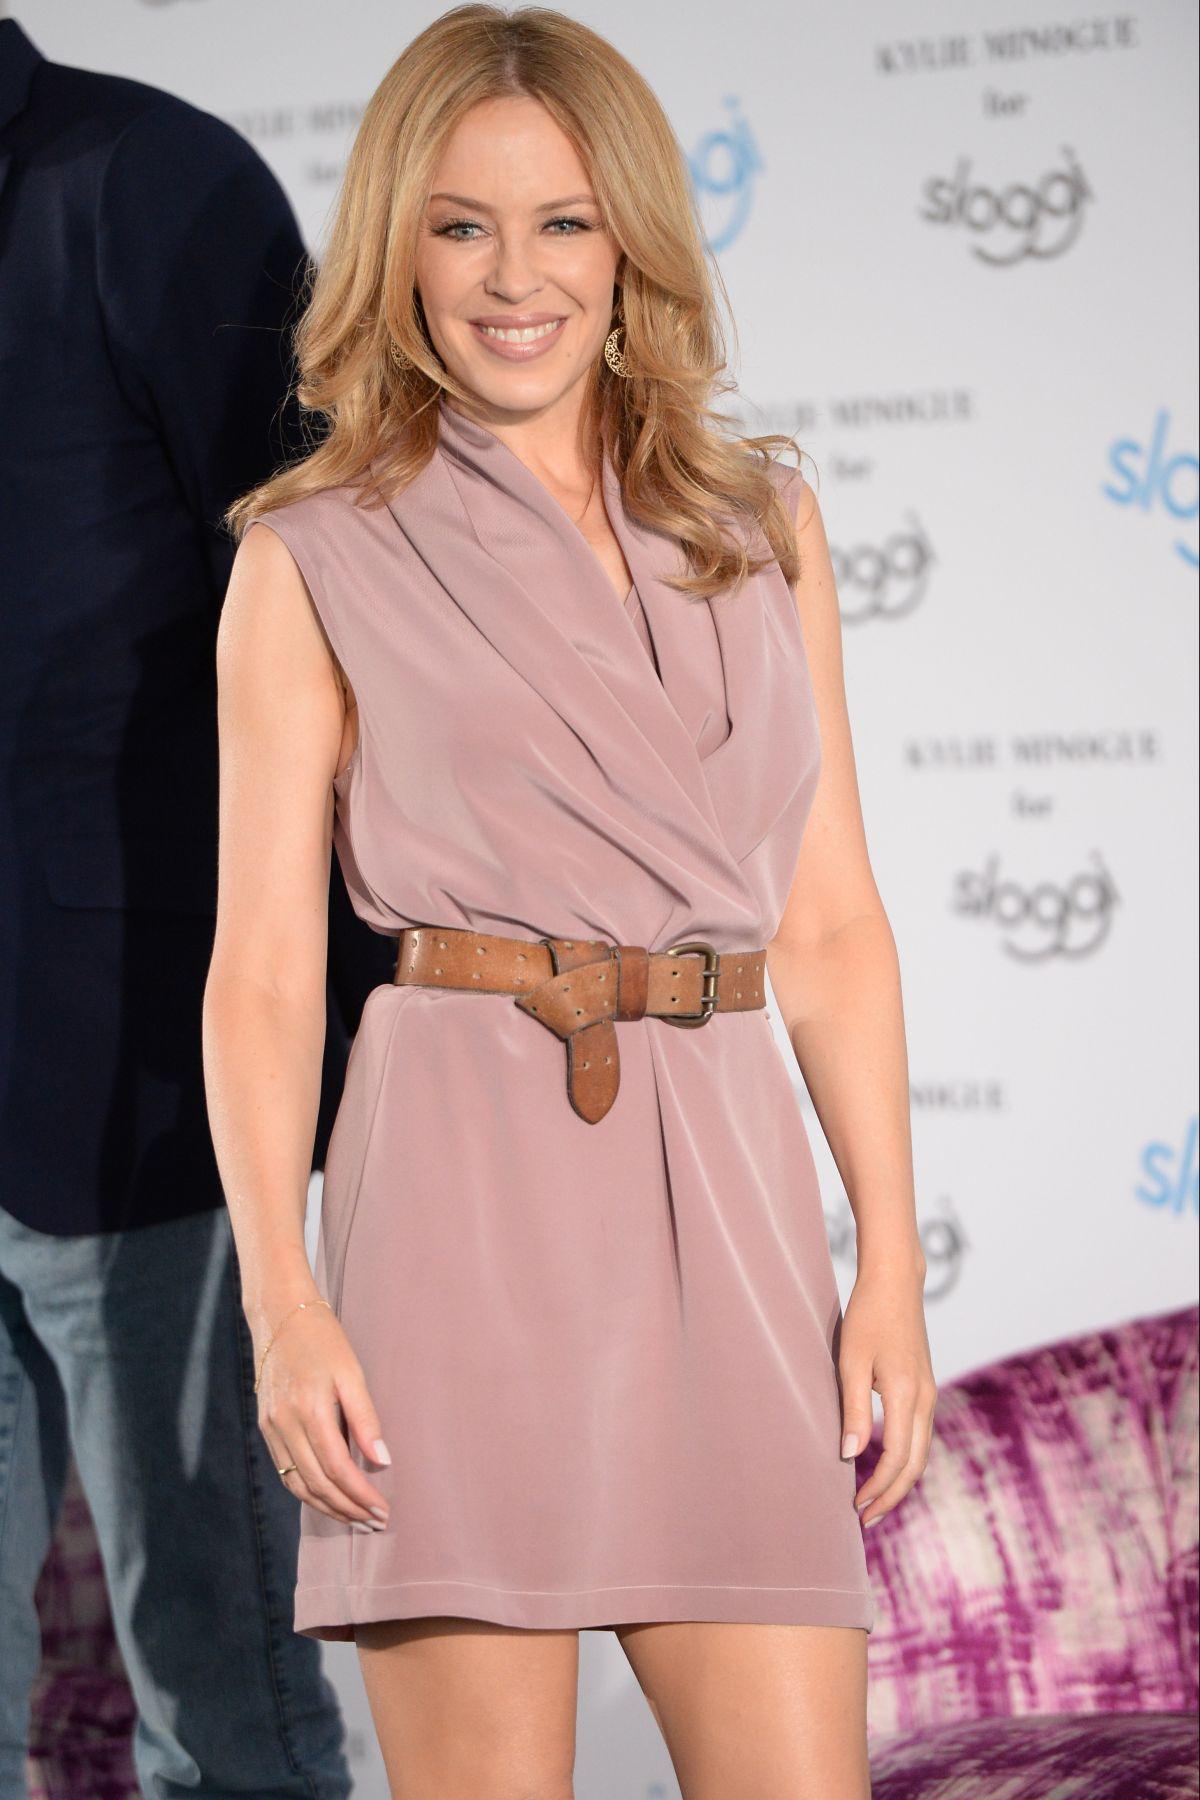 Forum Org Showthread Php Kylie Minogue Sloggi Lingerie Amp Berlin Demi Lovato Qa